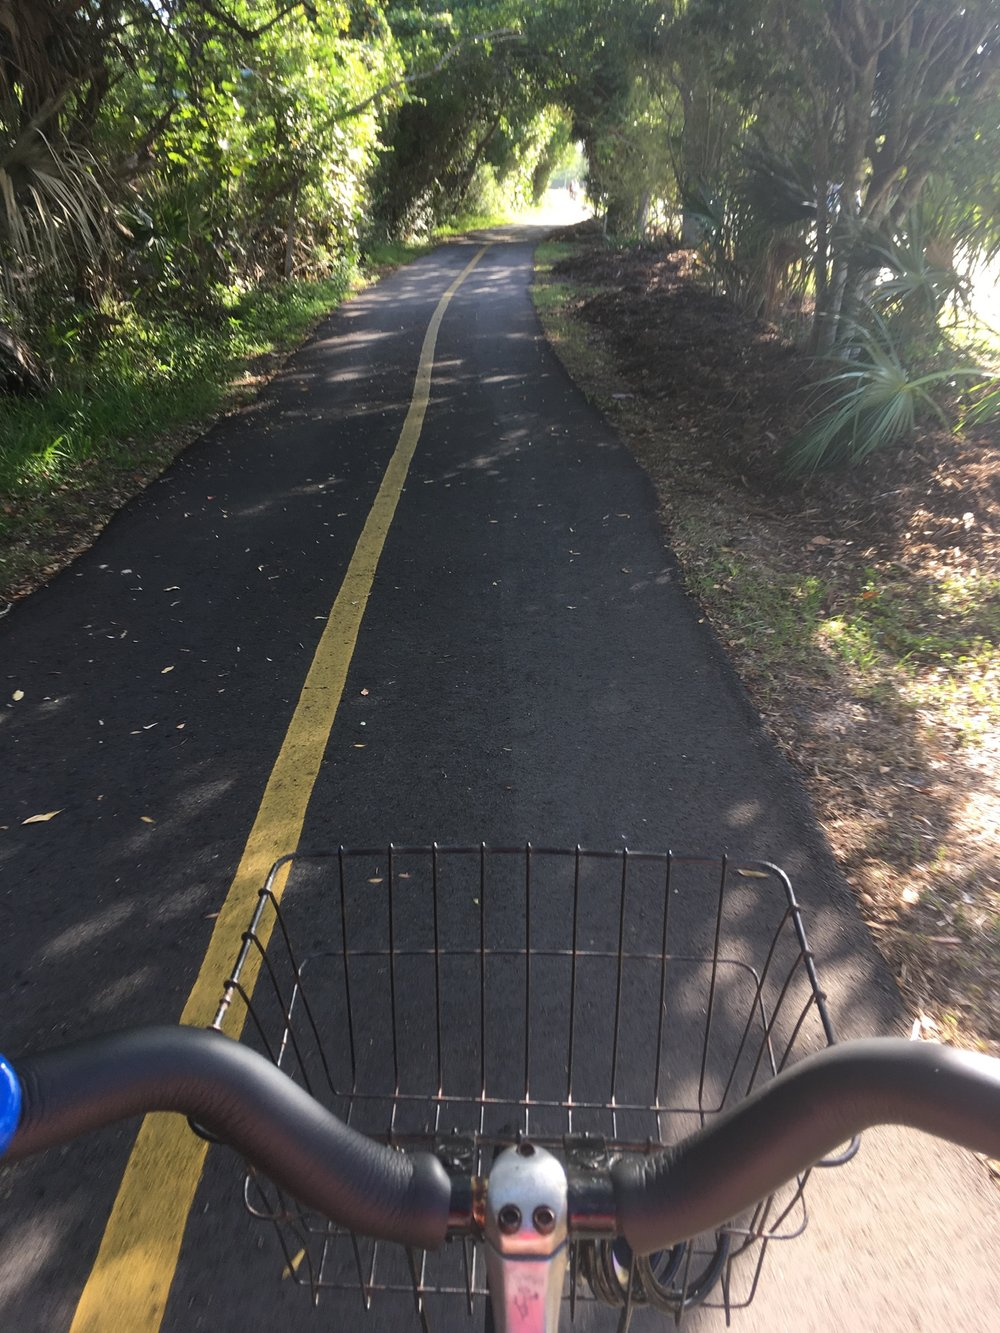 22 MILES OF BIKING/WALKING TRAILS